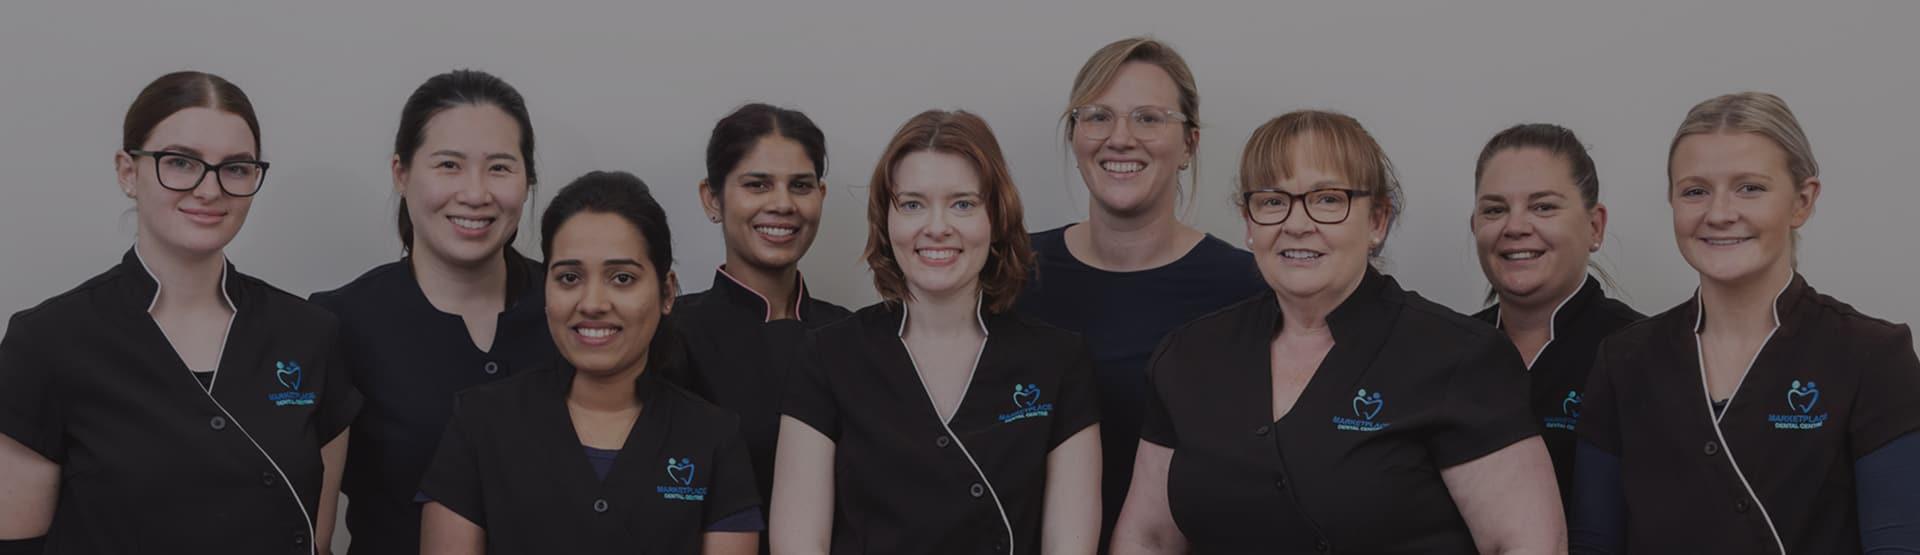 Marketplace Dental Staff